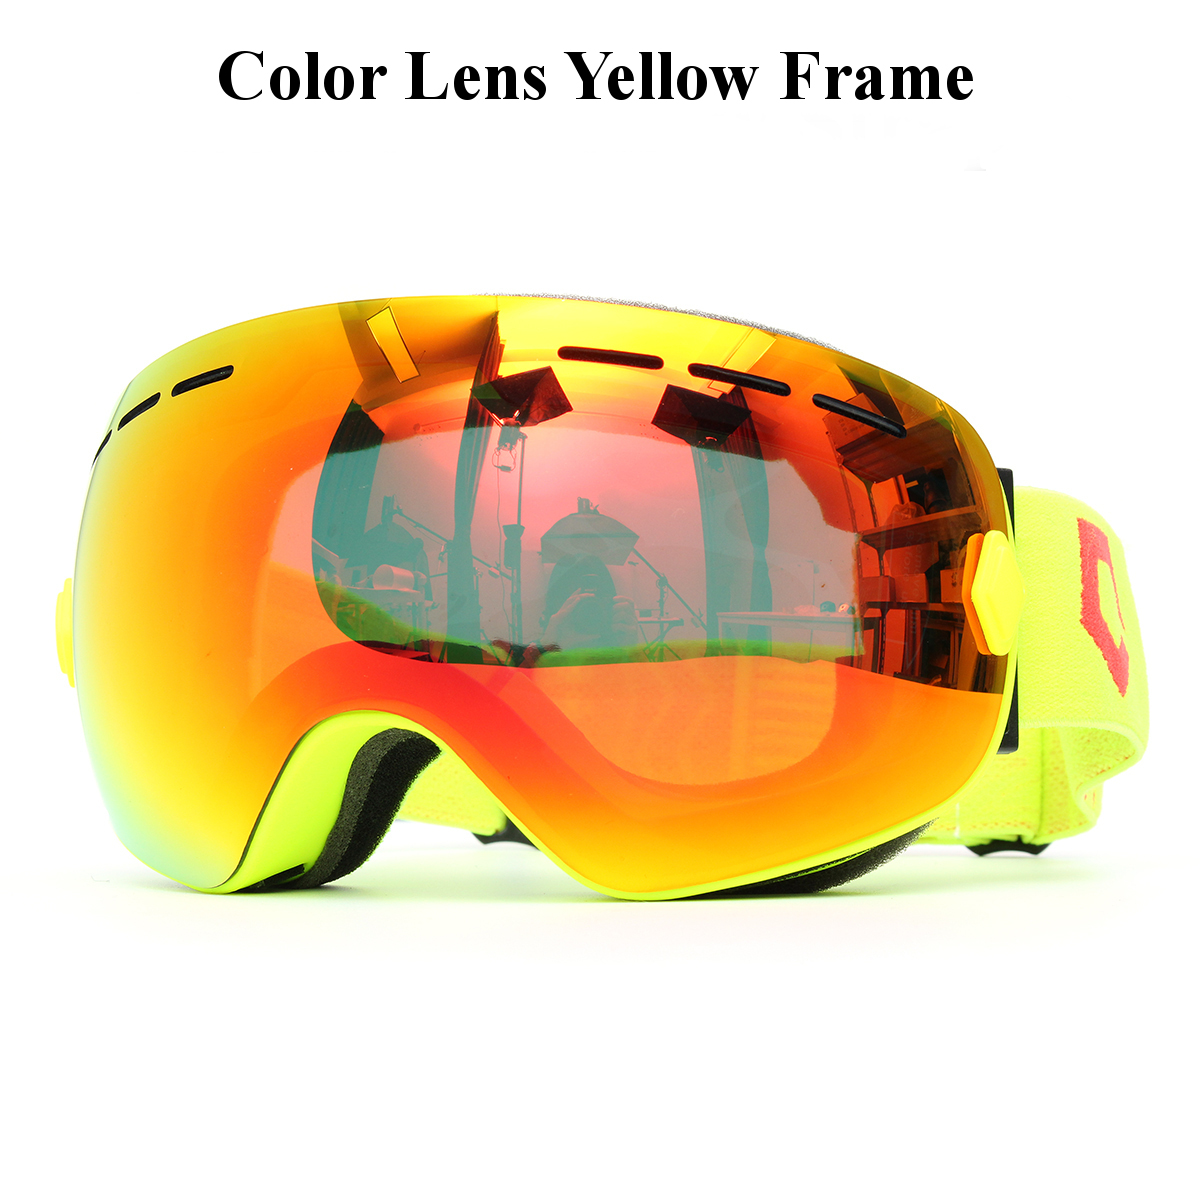 ski goggle yellow frame